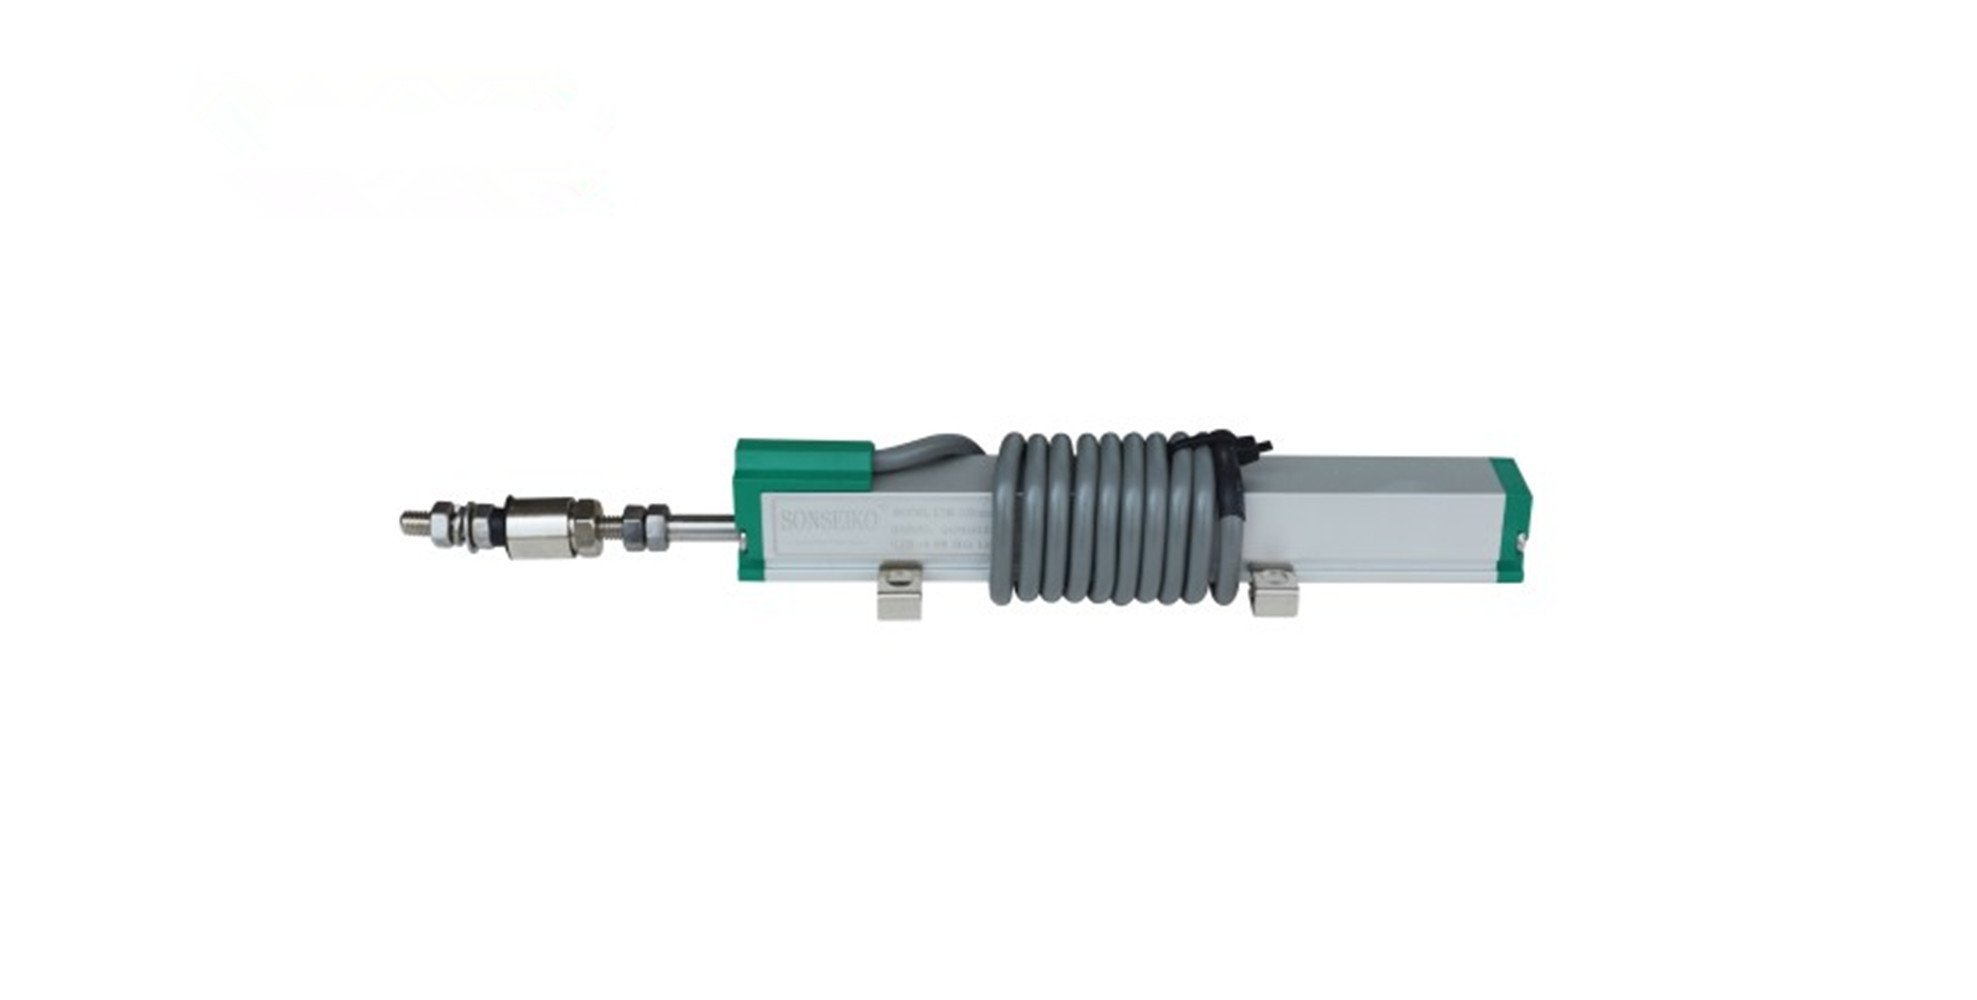 ACCURACY KTM micro rod type linear displacement sensor 225mm linear sensor KTM-225MM